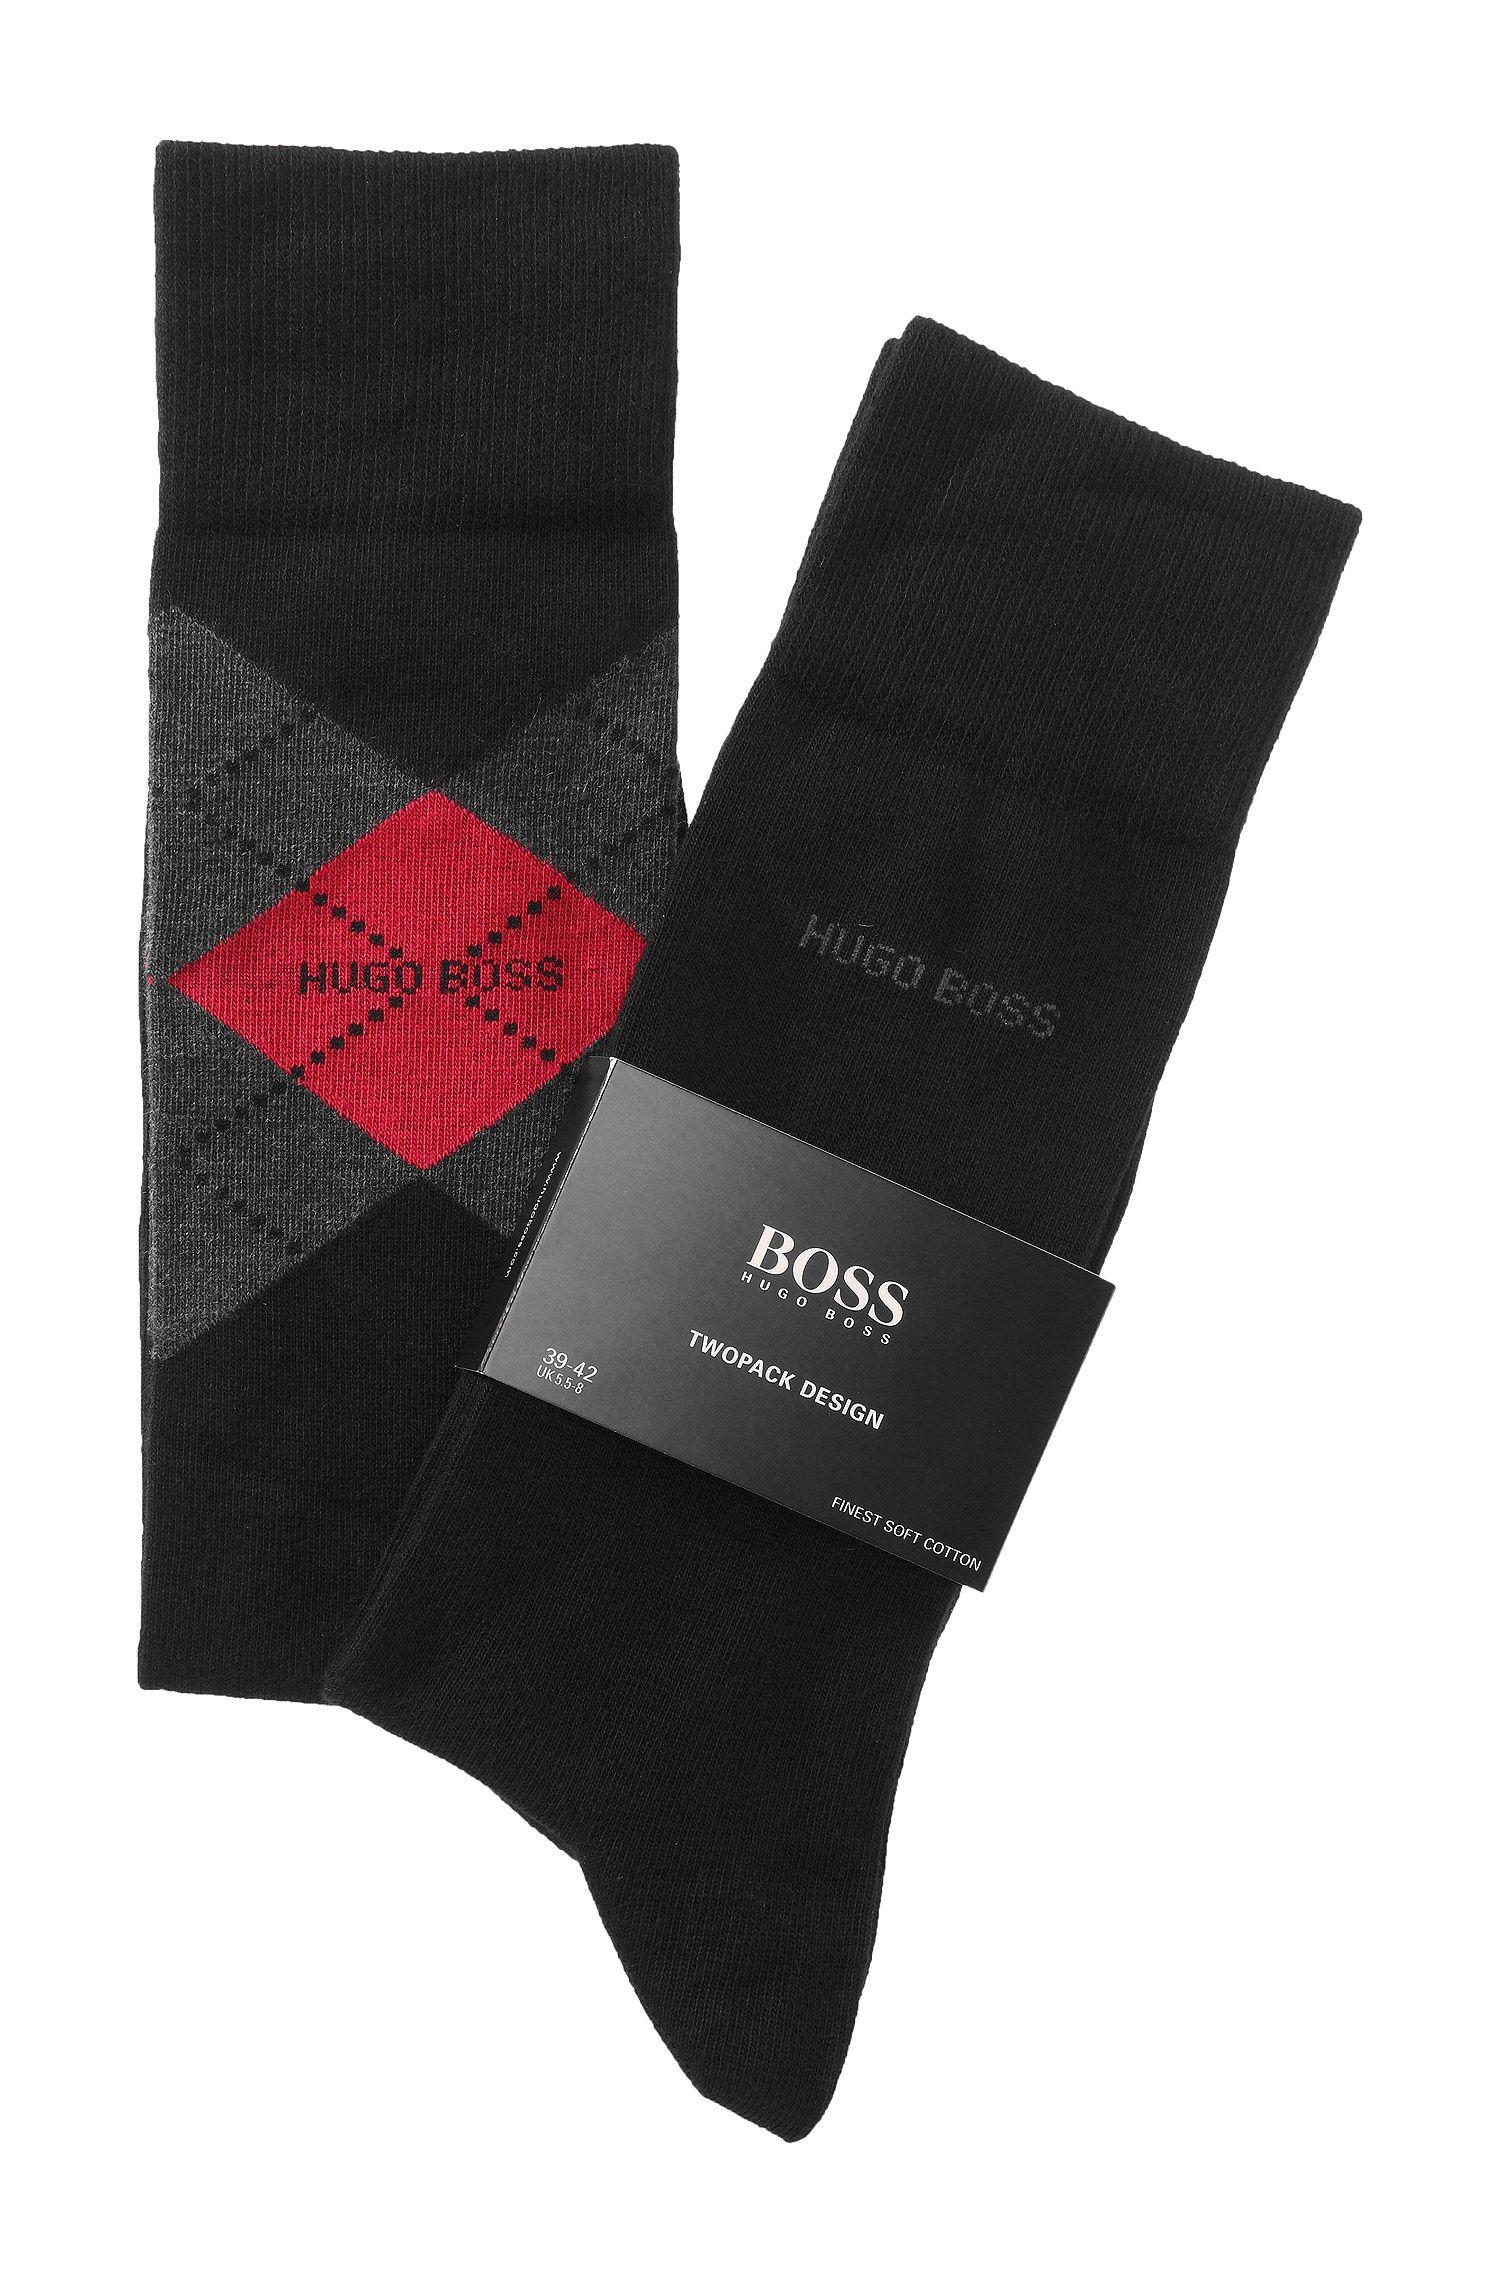 Socken-Doppelpack ´Twopack RS Design`